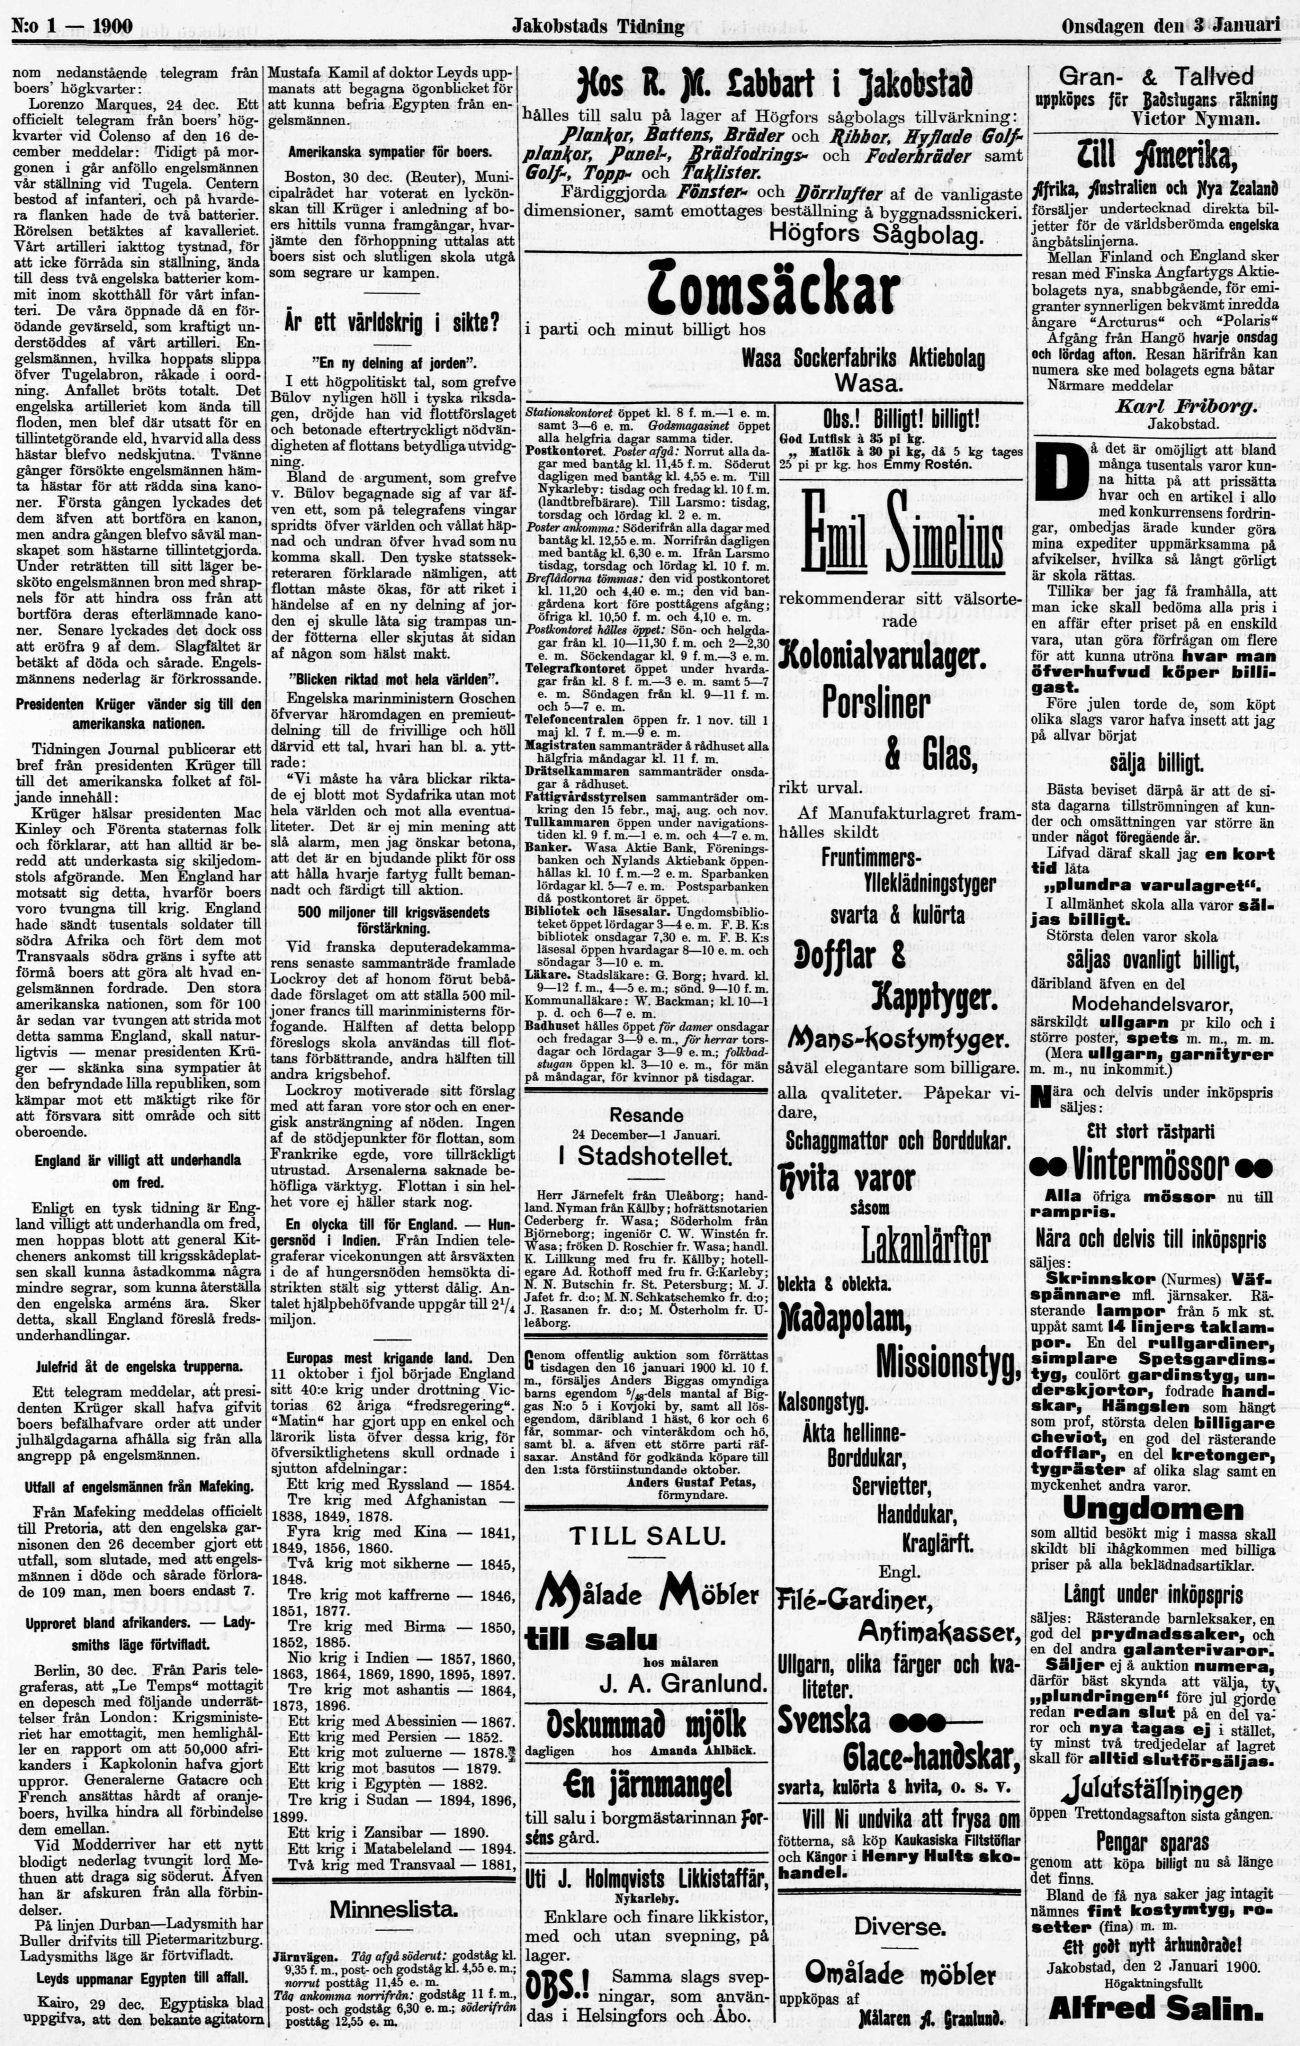 Jakobstads Tidning